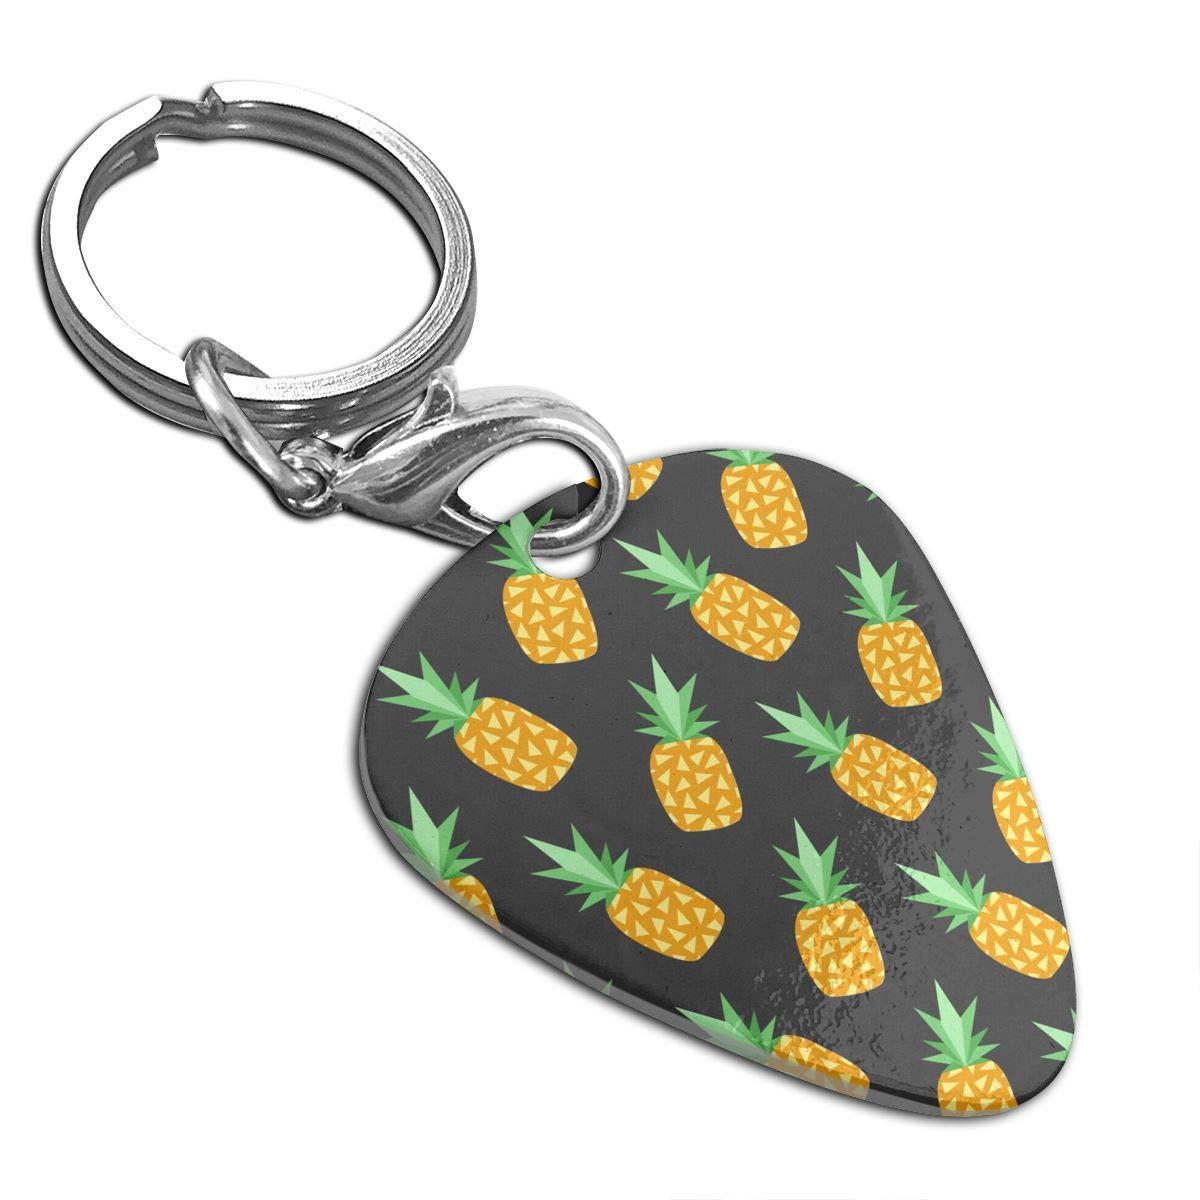 Pineapple Pug Guitar Pick Necklace Unique Custom Fashion Pet Card Keychain